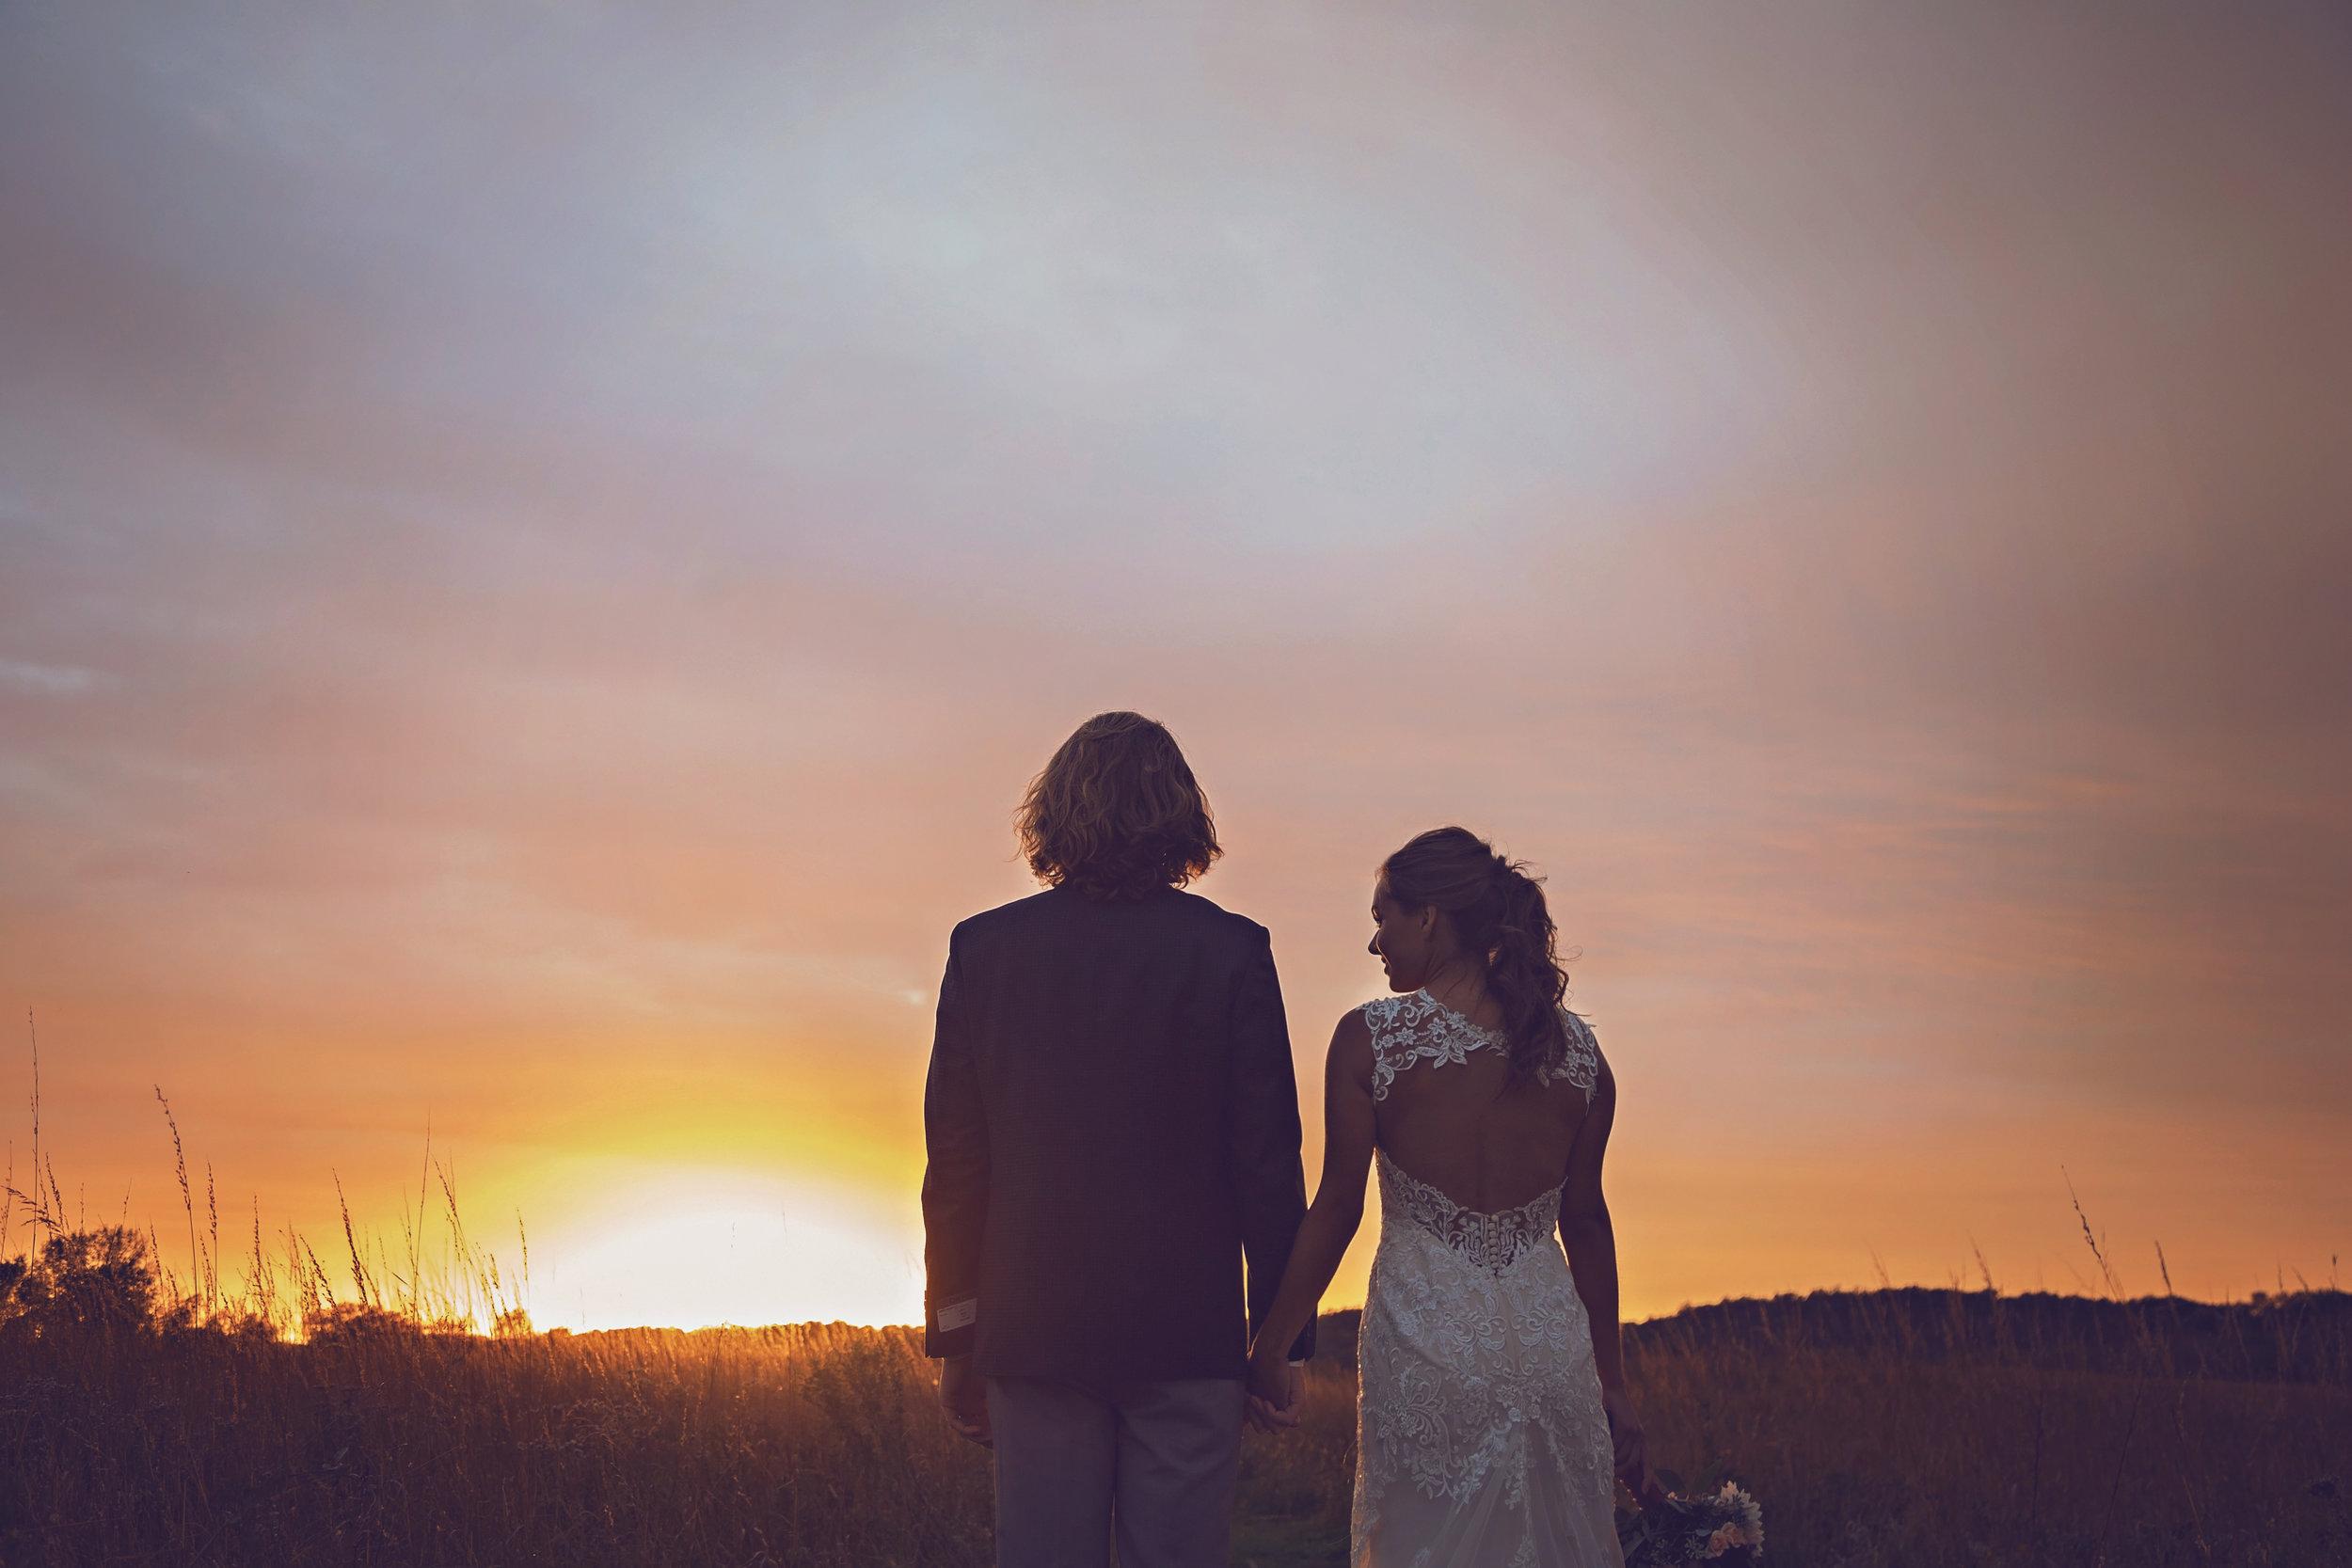 MINNESOTA WEDDING PHOTOGRAPHER   INTUITION WEDDINGS BY ID PHOTOGRAPHY